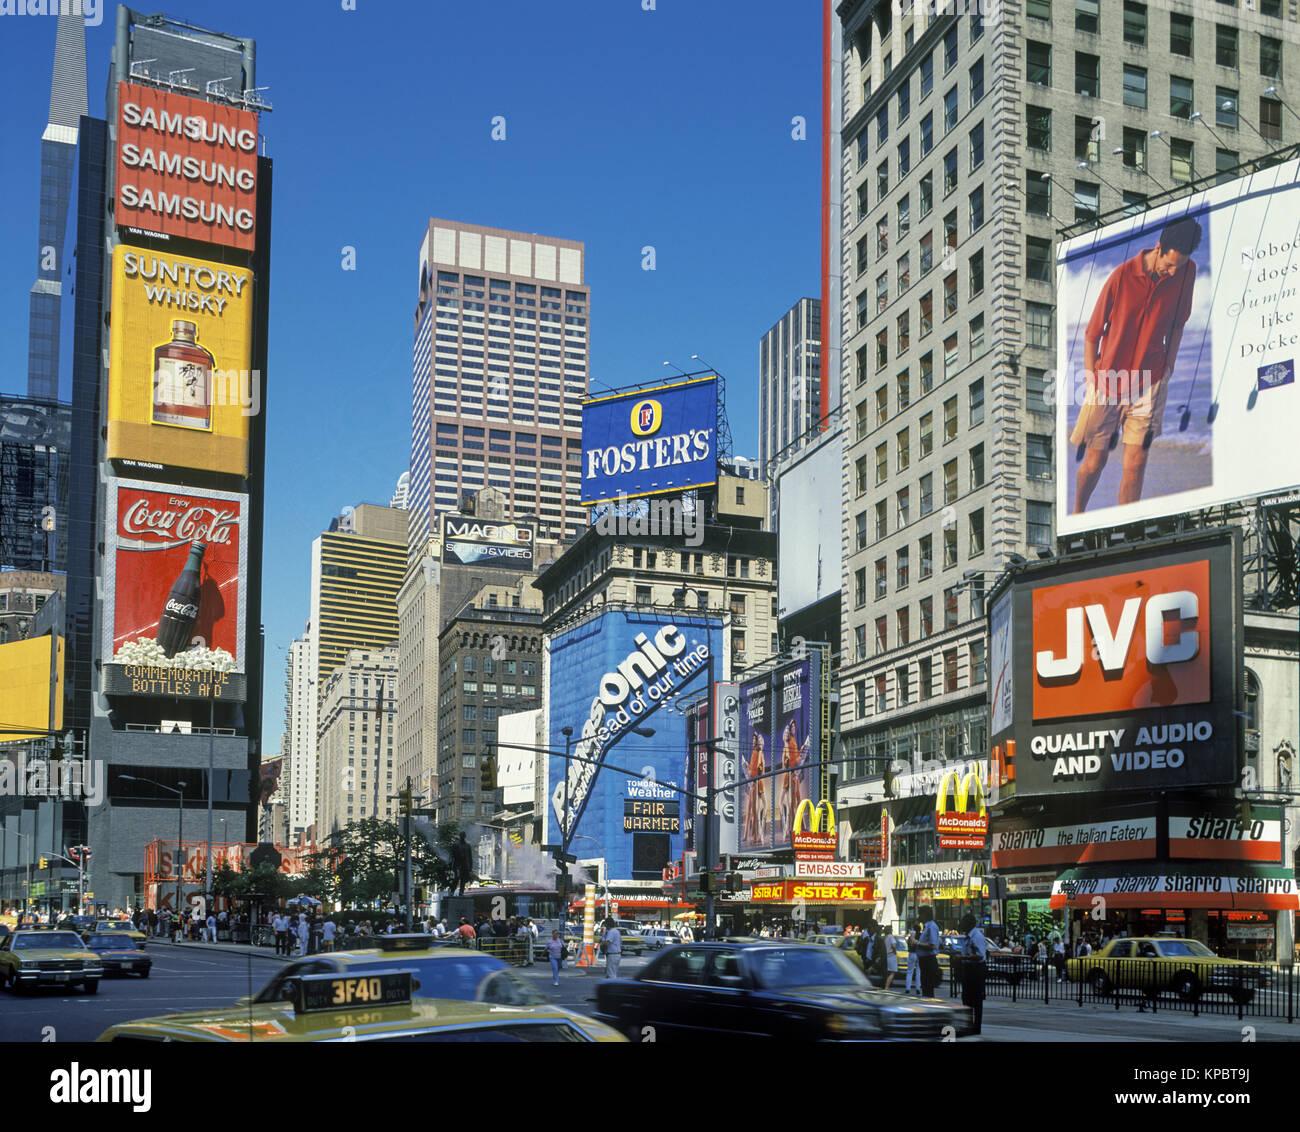 Manhattan To New York City: 1992 HISTORICAL TIMES SQUARE MANHATTAN NEW YORK CITY USA